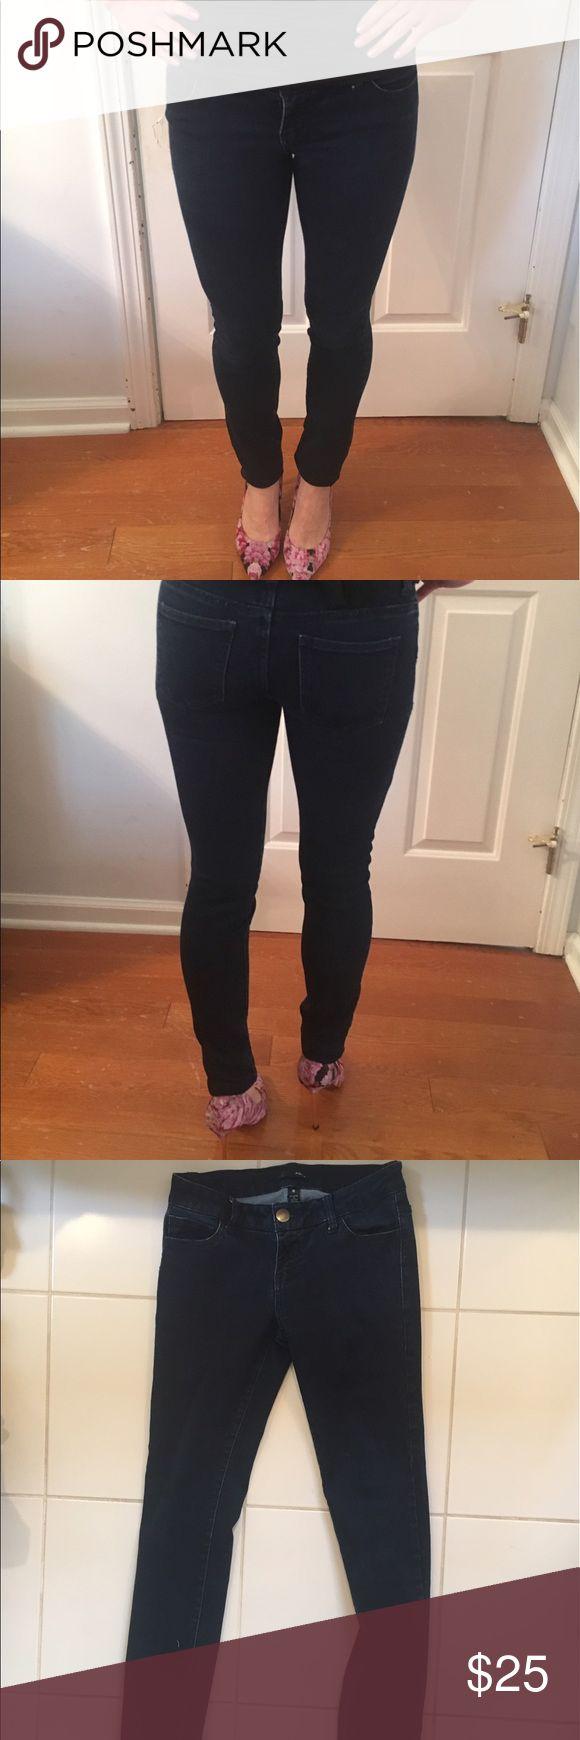 Aqua jeans Aqua jeans Aqua Jeans Skinny